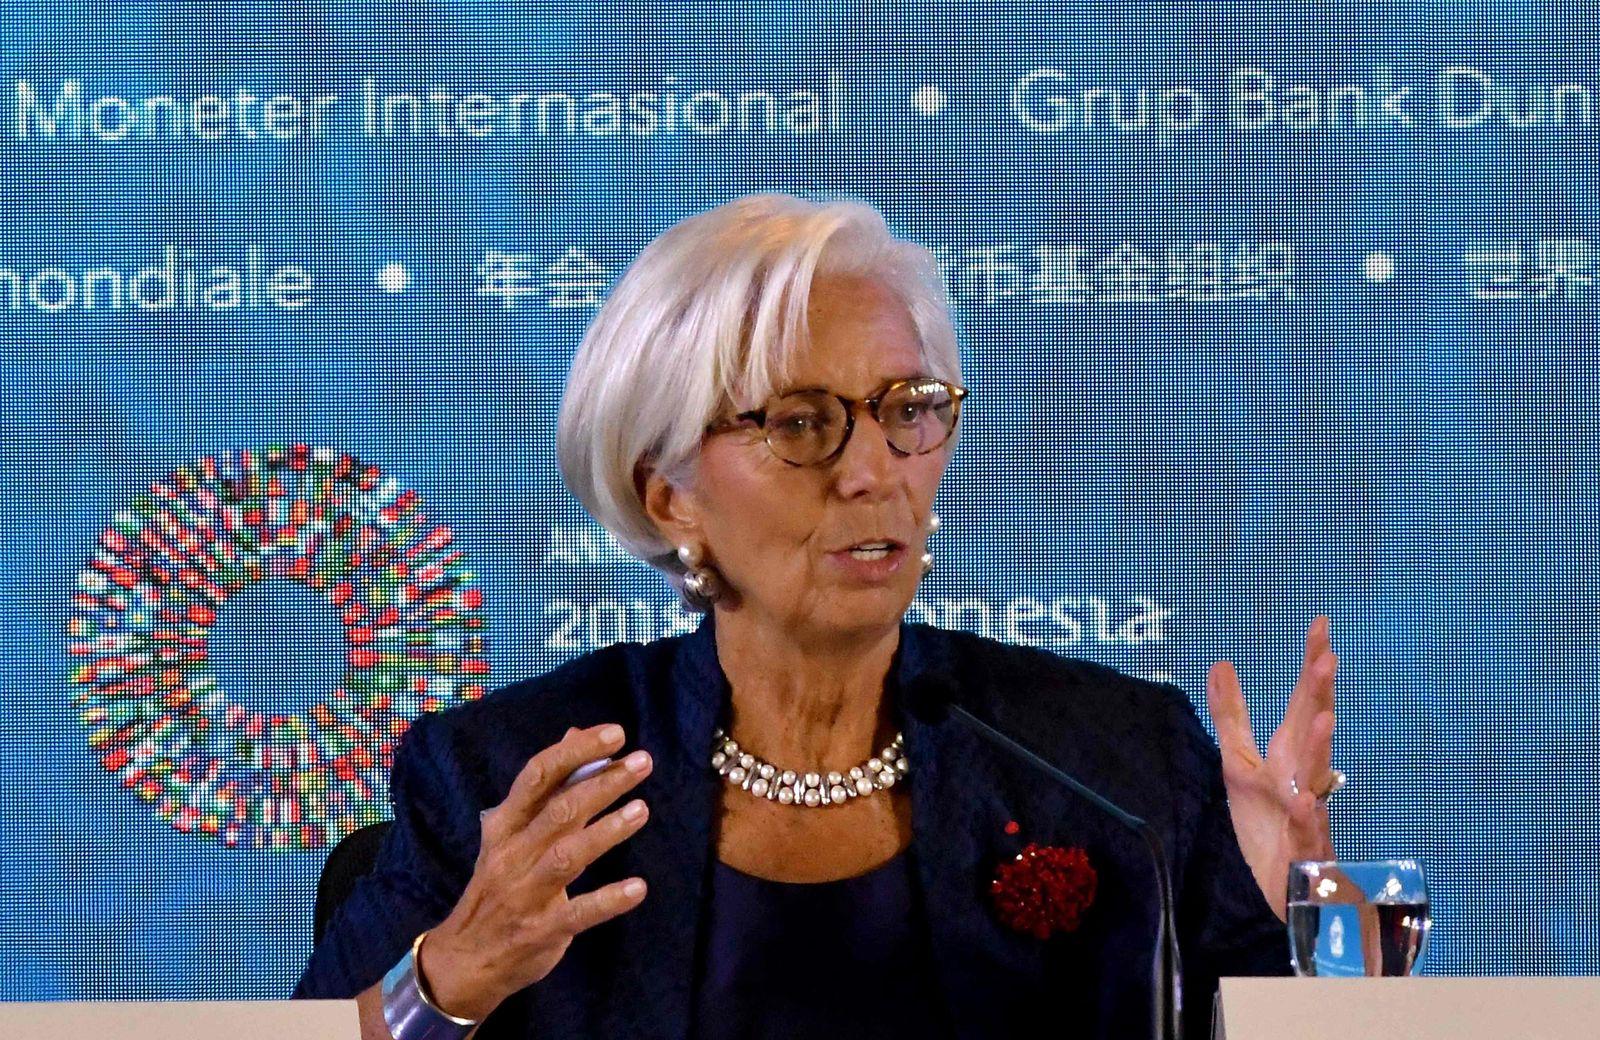 INDONESIA-IMF-WORLD BANK-DIPLOMACY